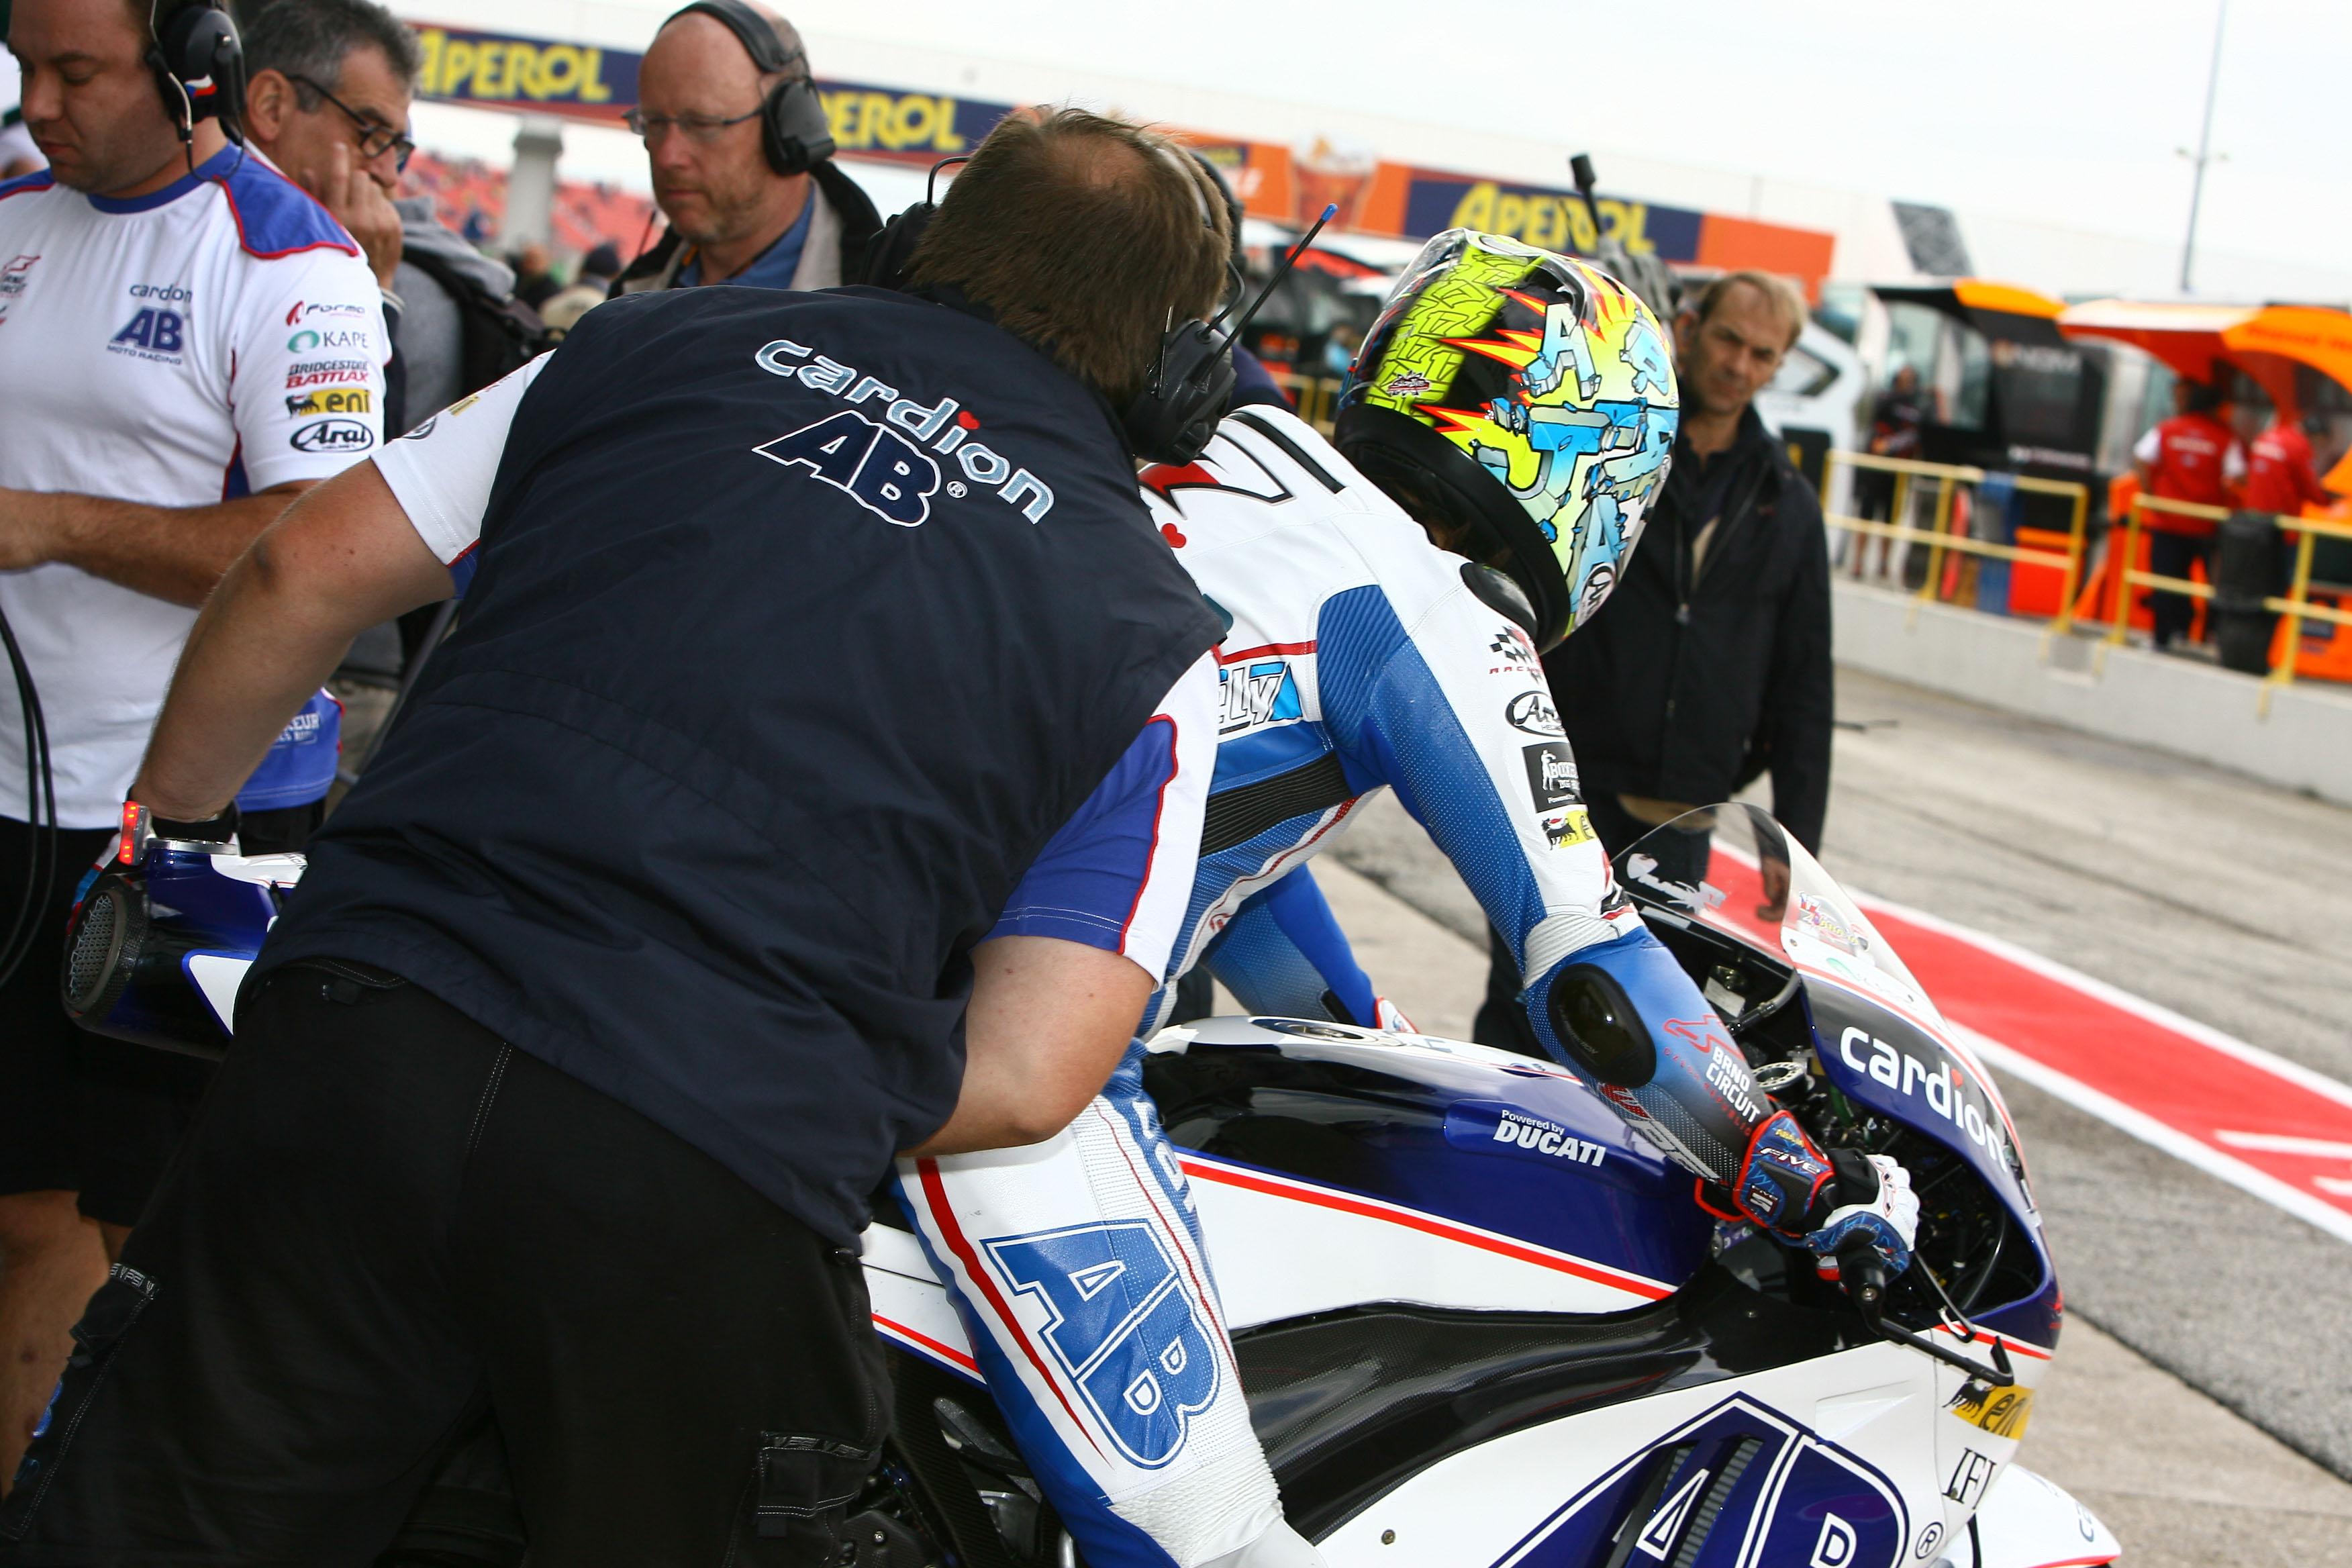 Karel Abraham, AB Cardion, Moto GP, Misano, September 2012